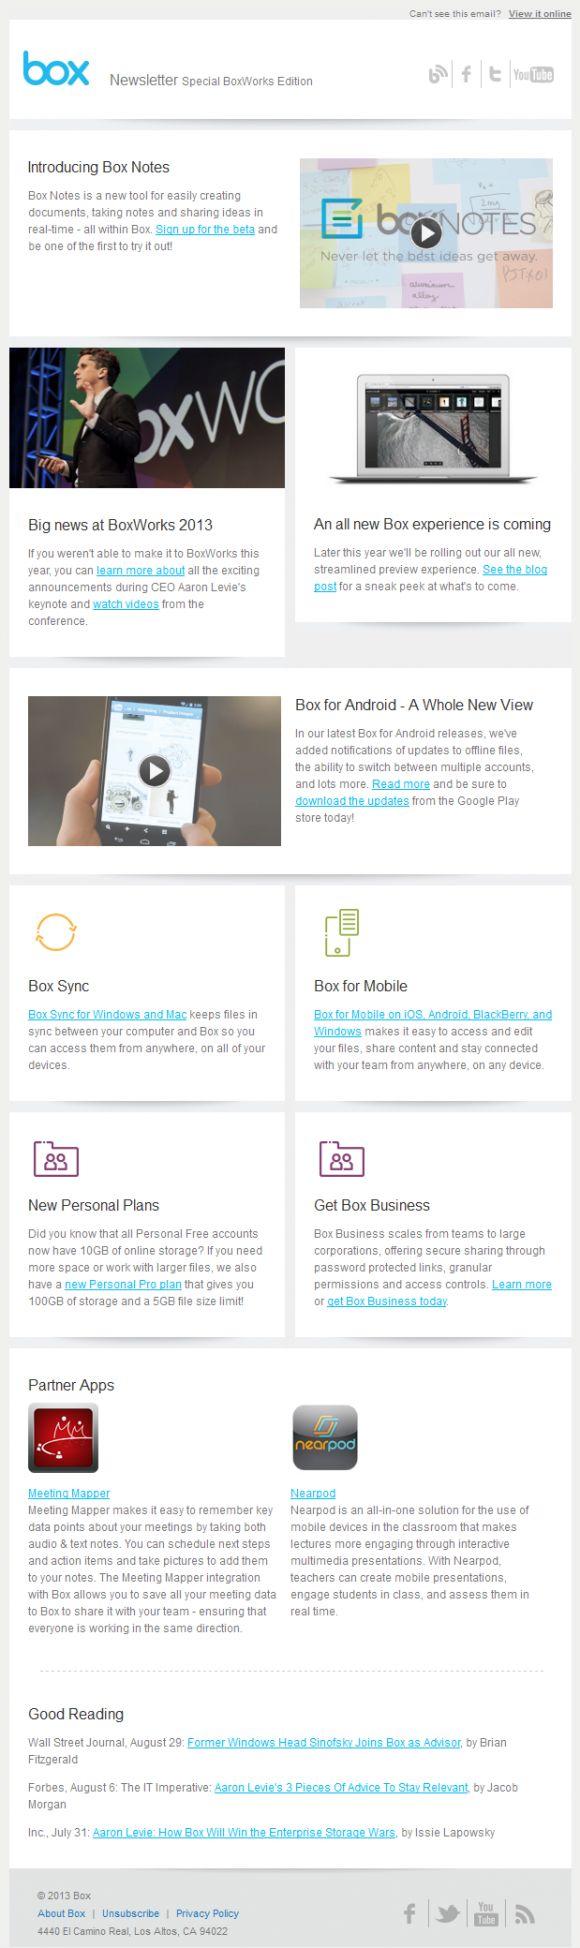 Box newsletter html email marketing design